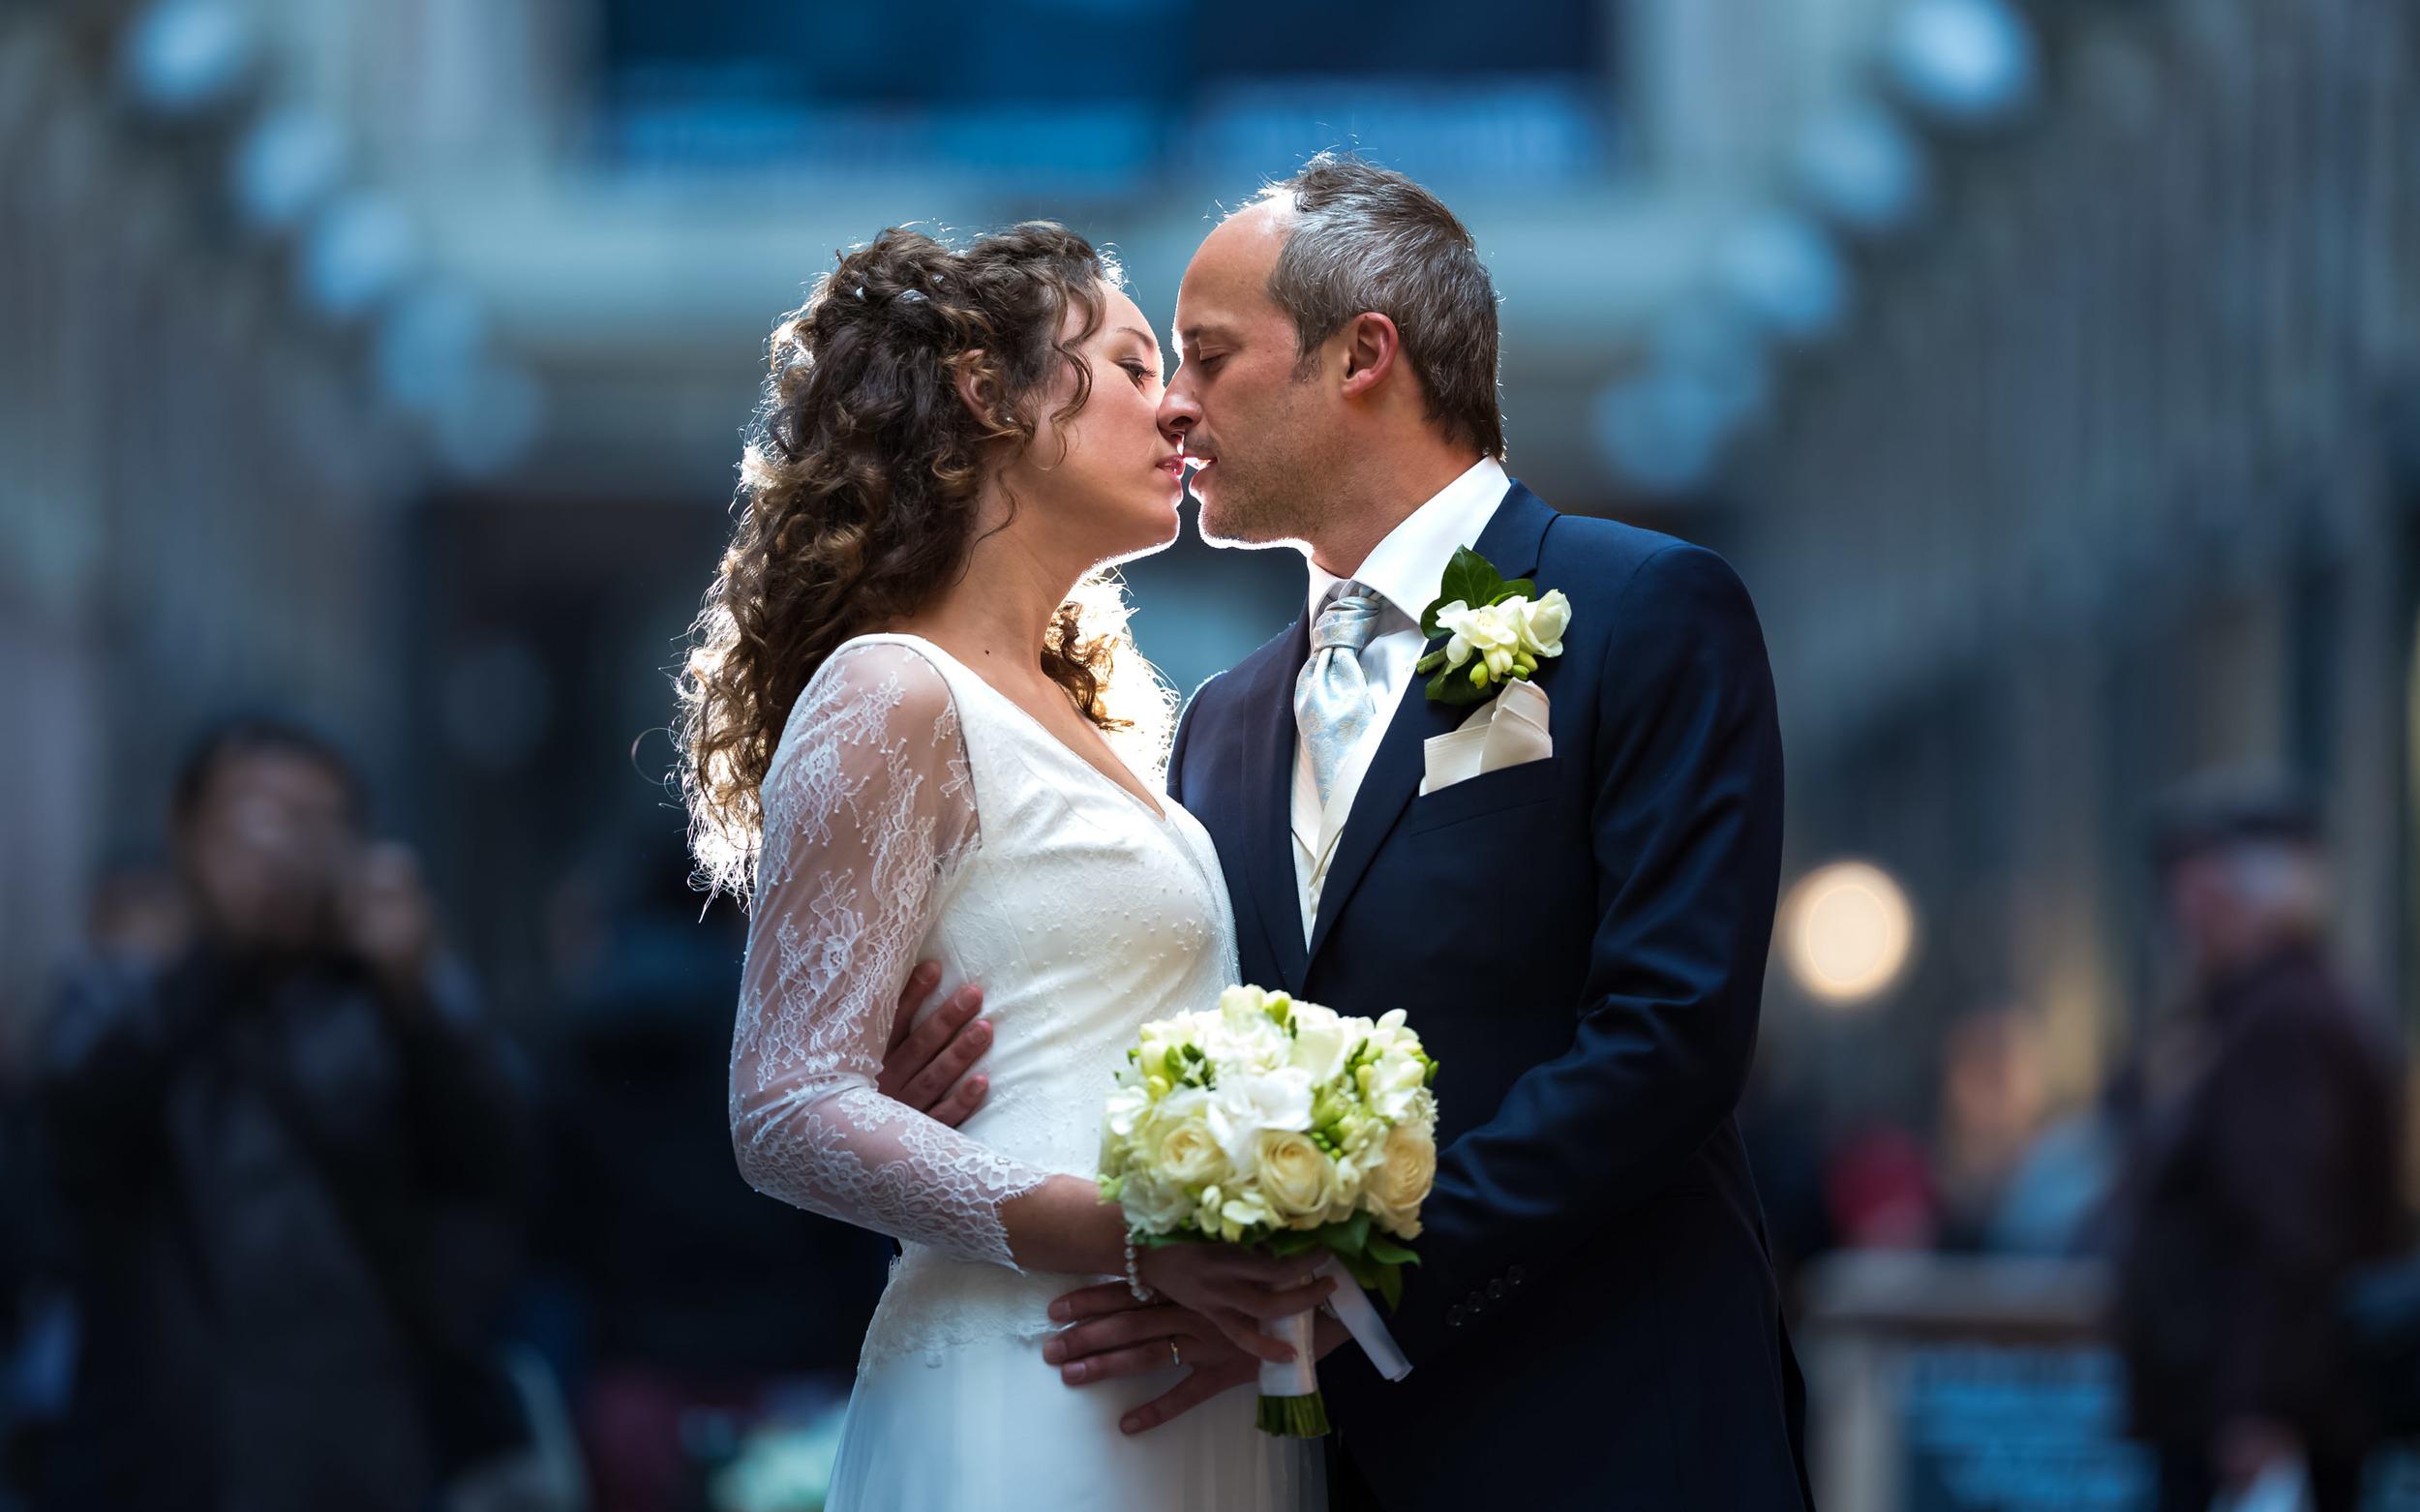 photographe-mariage-bruxelles.jpg